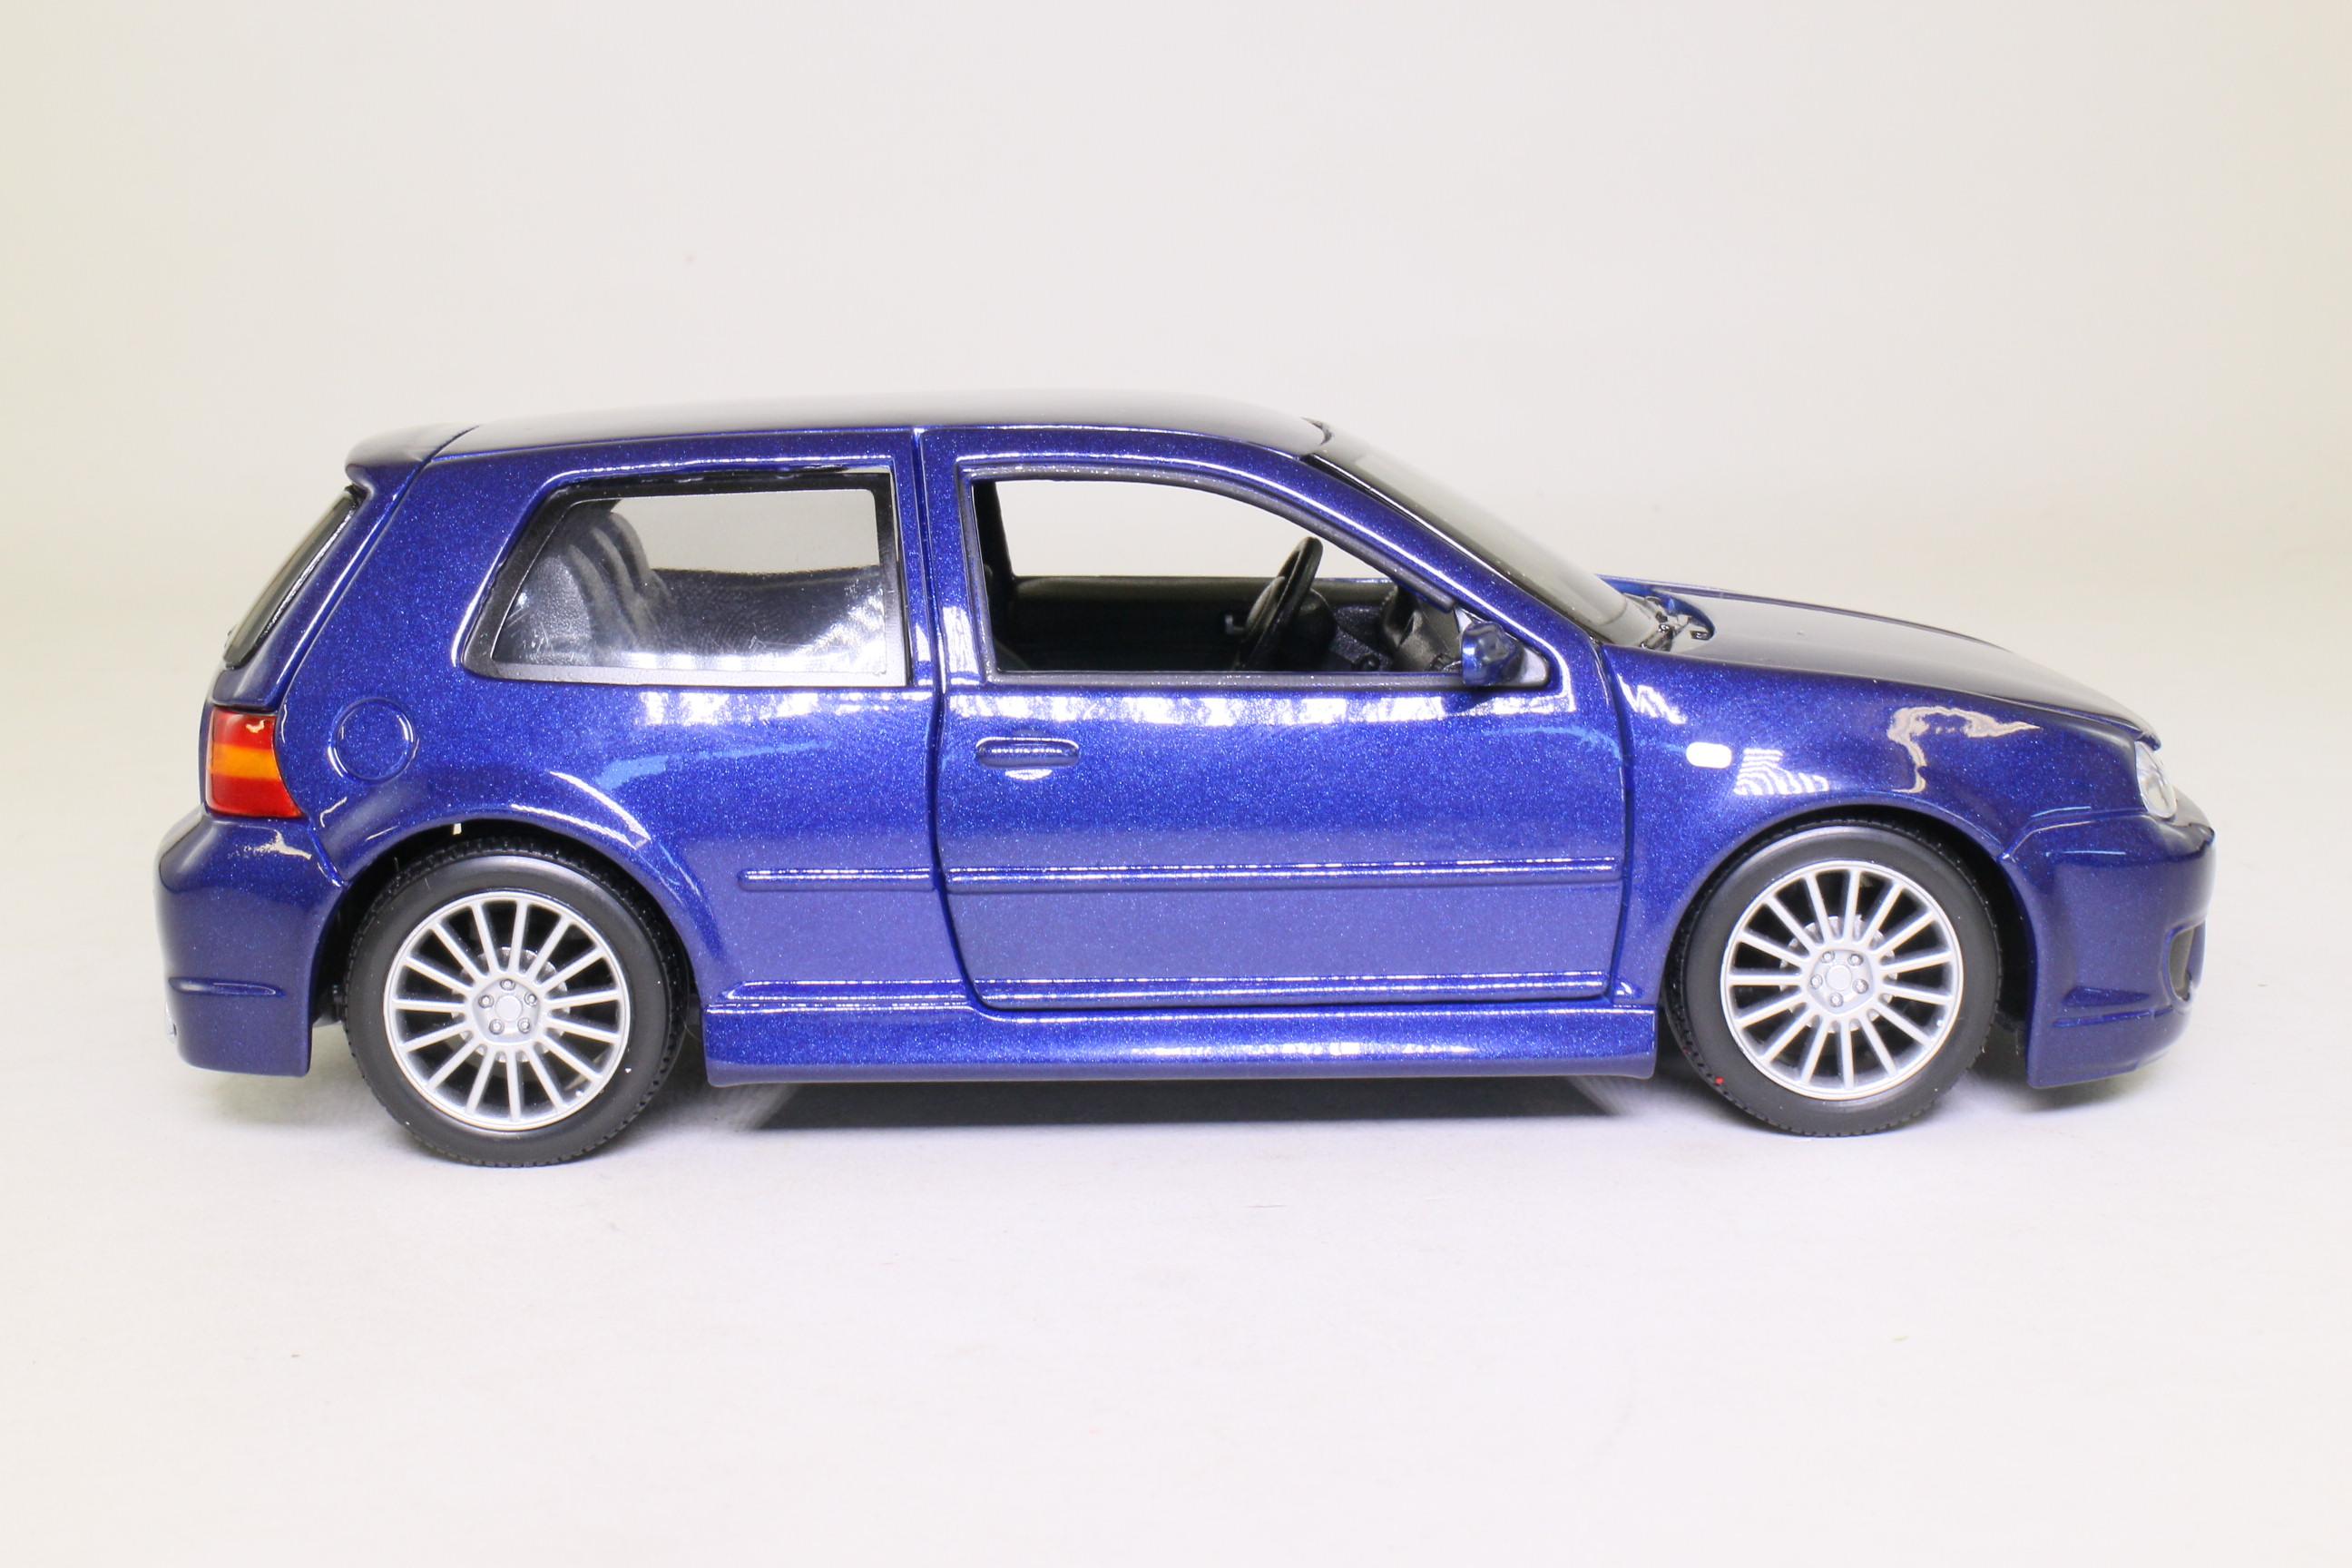 maisto 1 24 scale 2003 volkswagen golf r32 deep blue. Black Bedroom Furniture Sets. Home Design Ideas